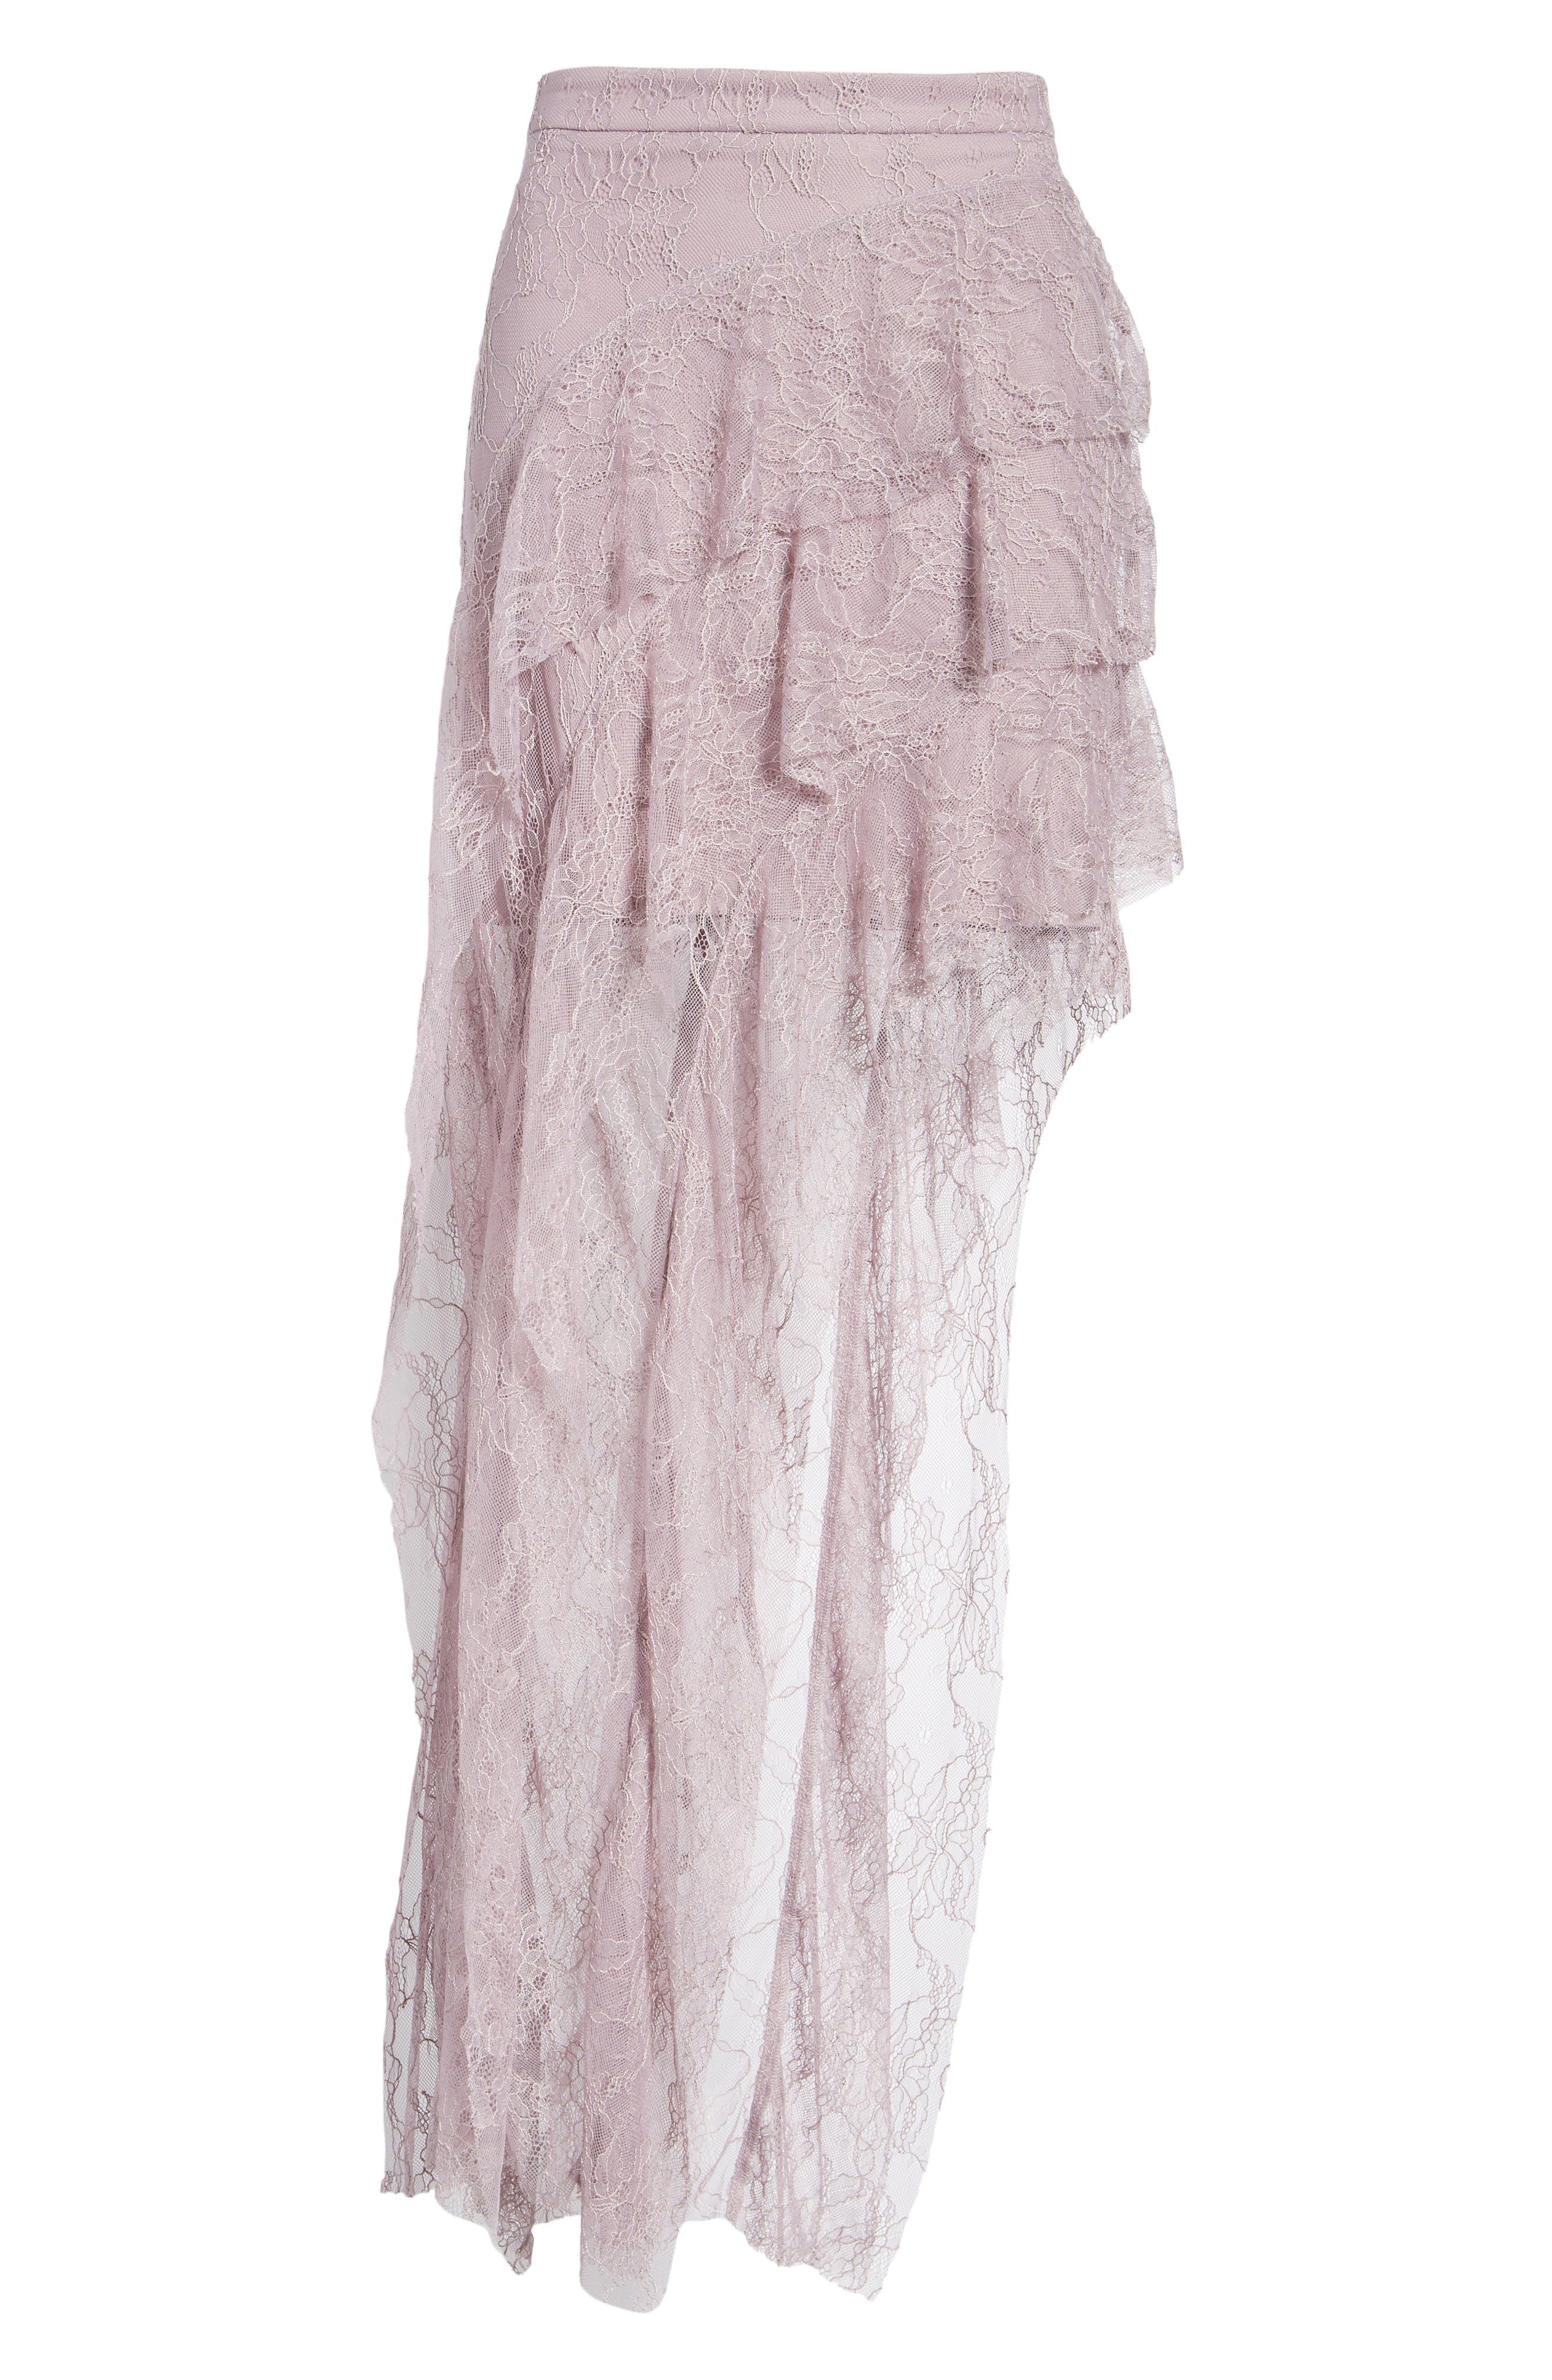 Emilia Ruffle Maxi Skirt,                             Alternate thumbnail 6, color,                             001